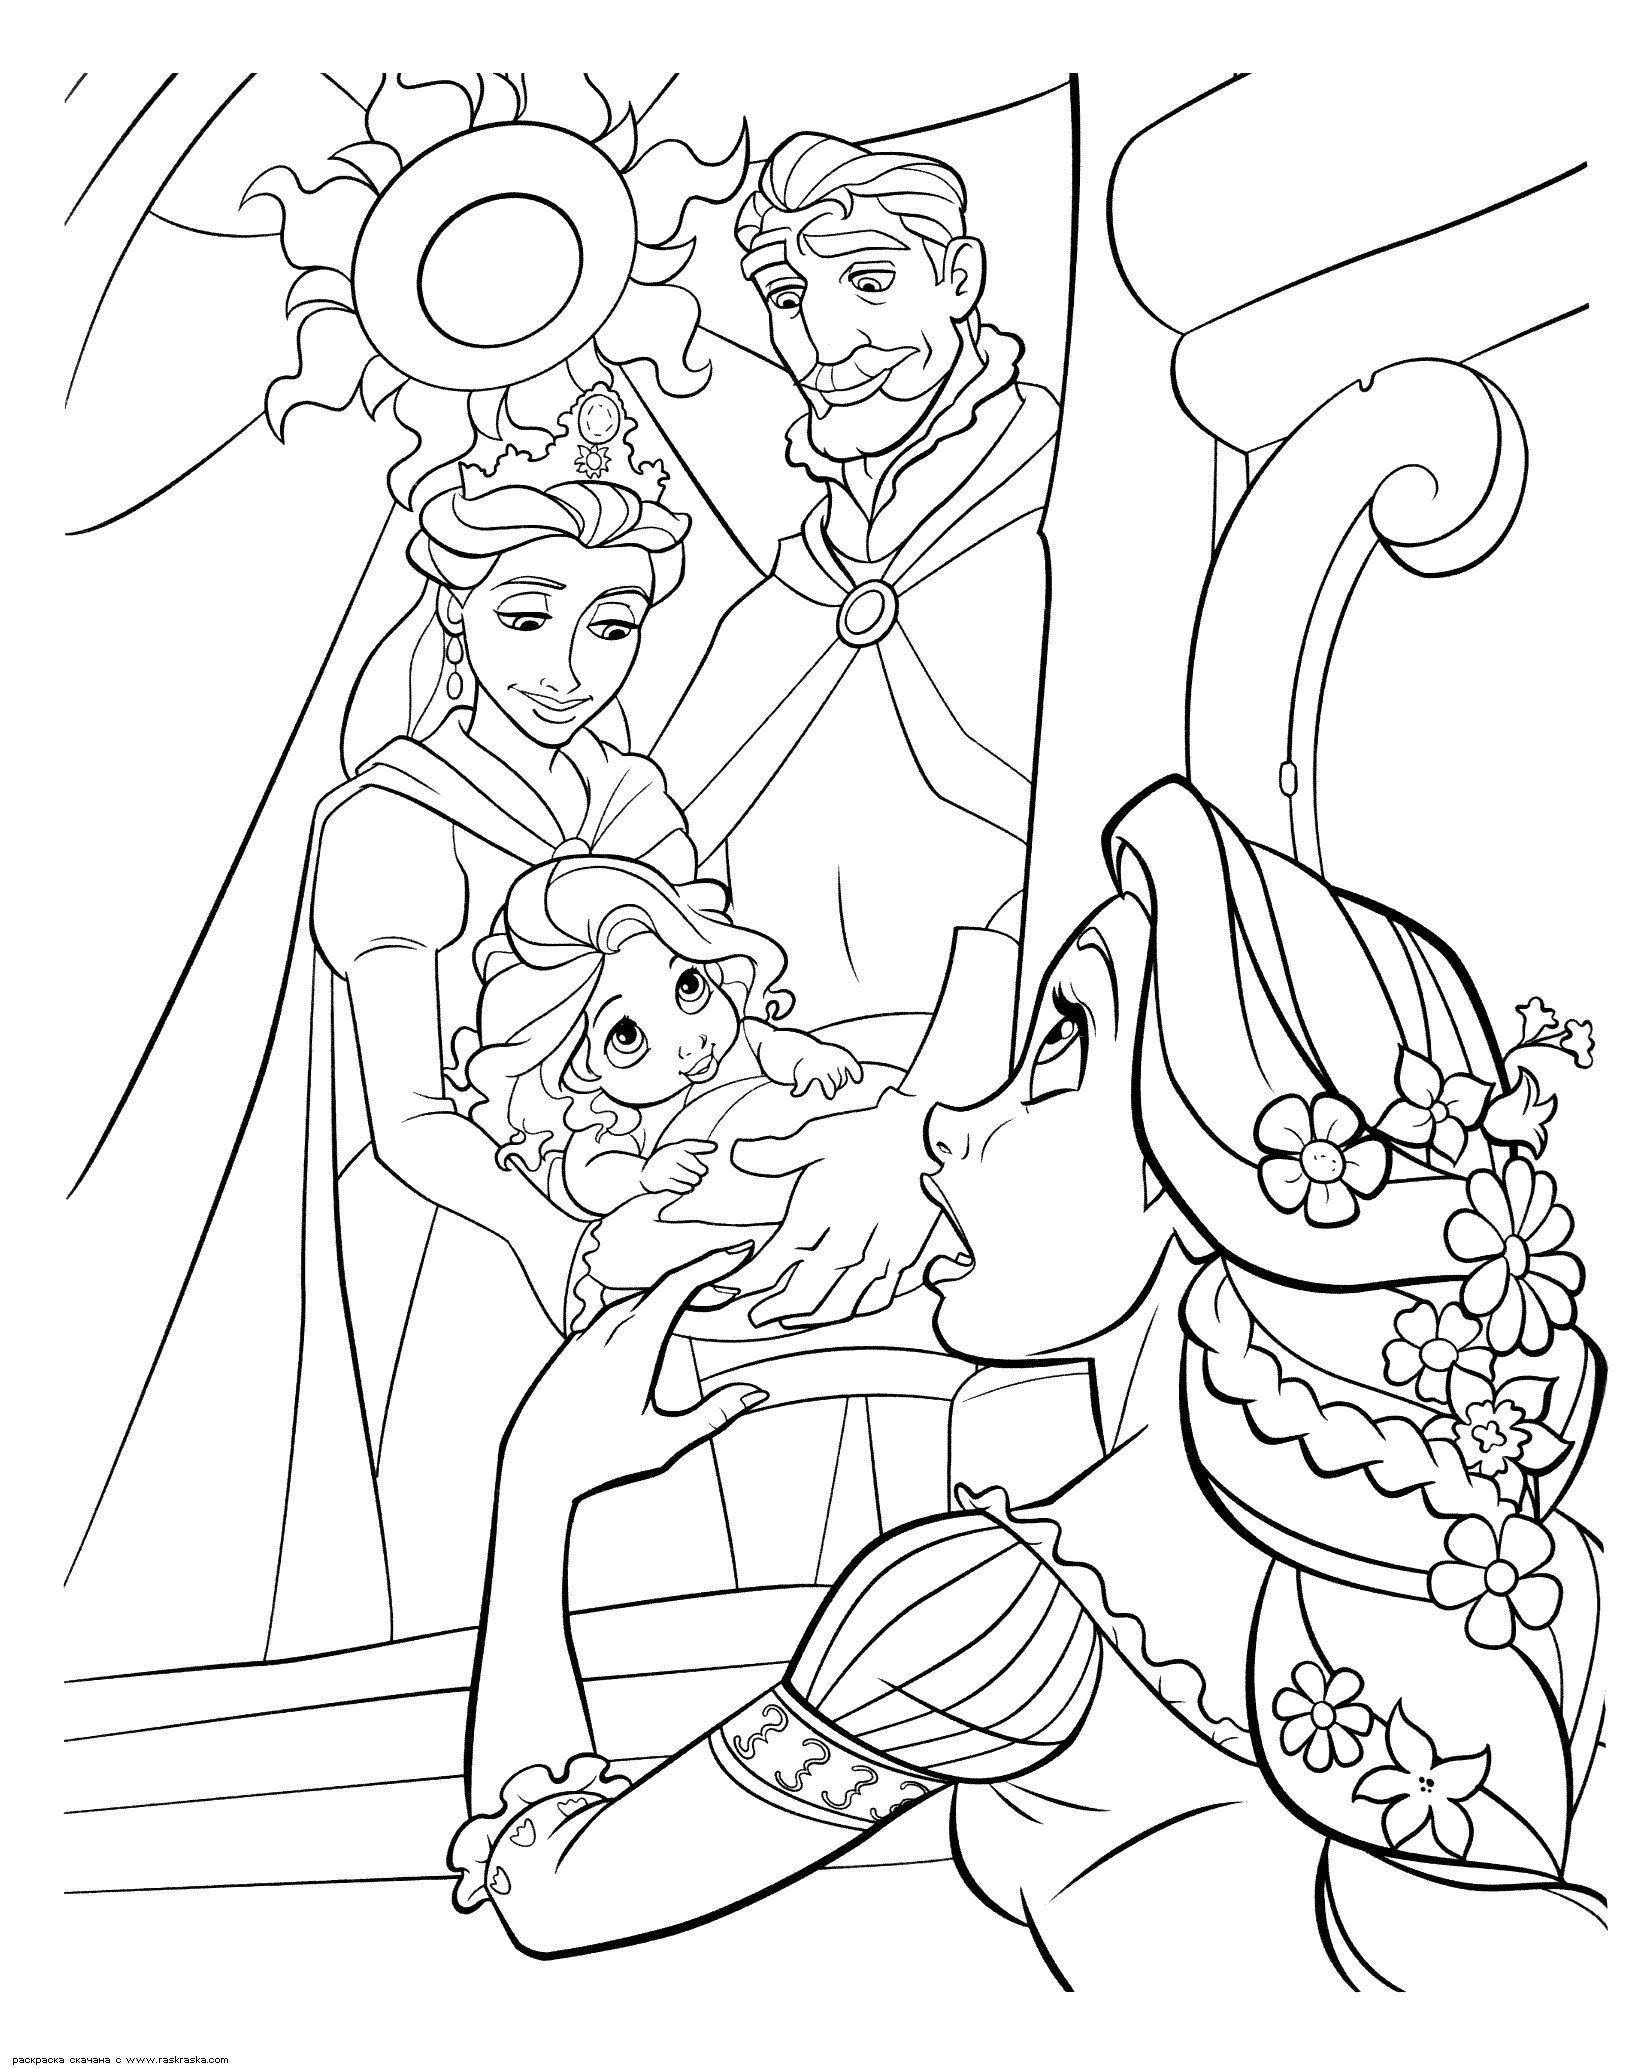 Nsfw Disney Coloring Book Rapunzel